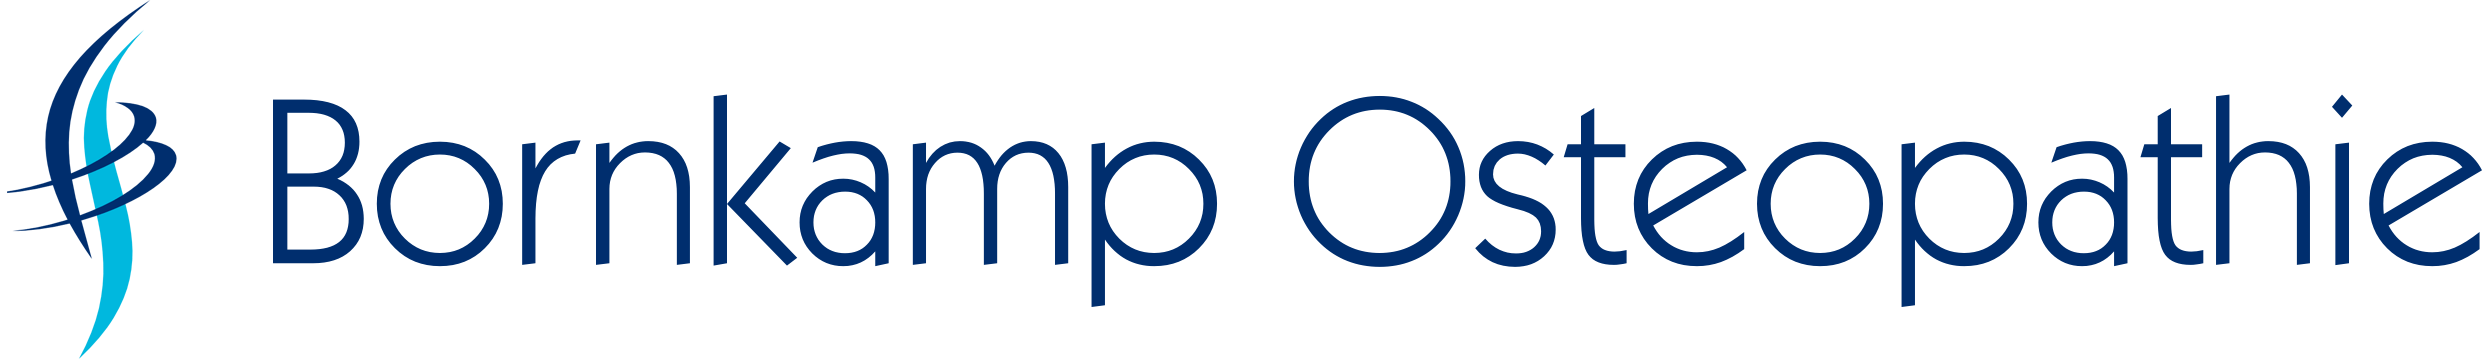 Bornkamp Osteopathie